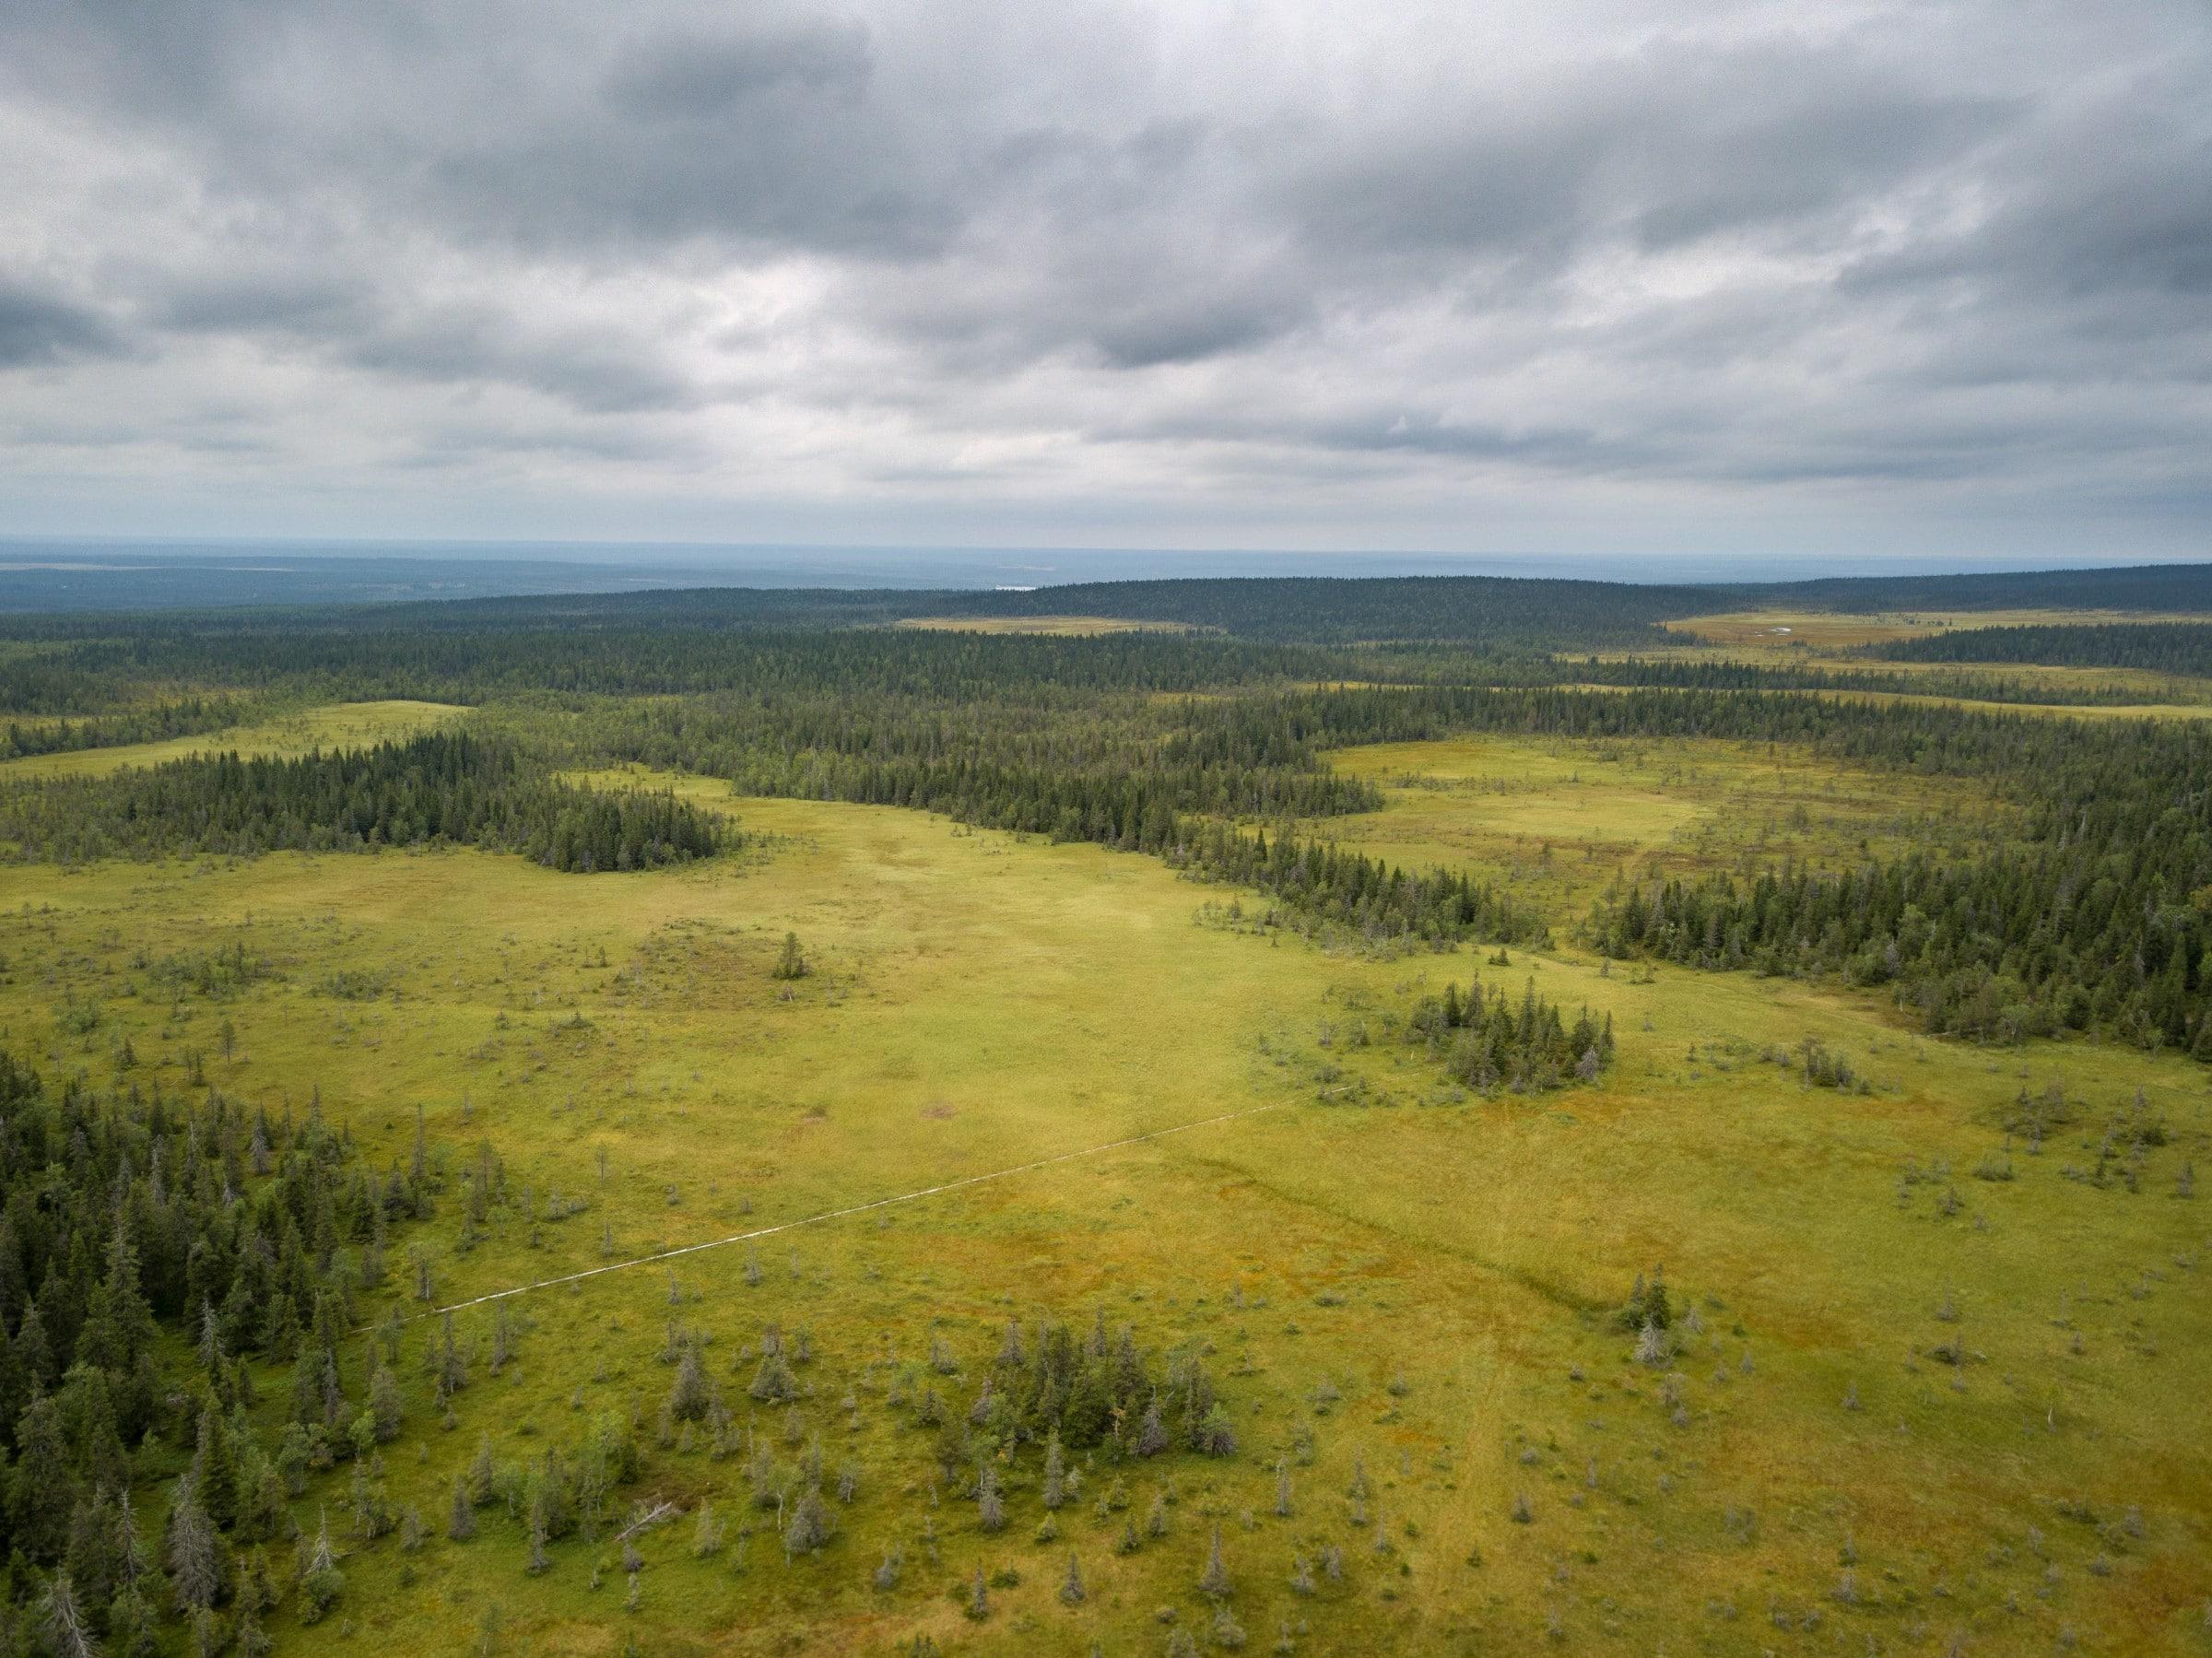 Syöte Nationaal Park, Finland